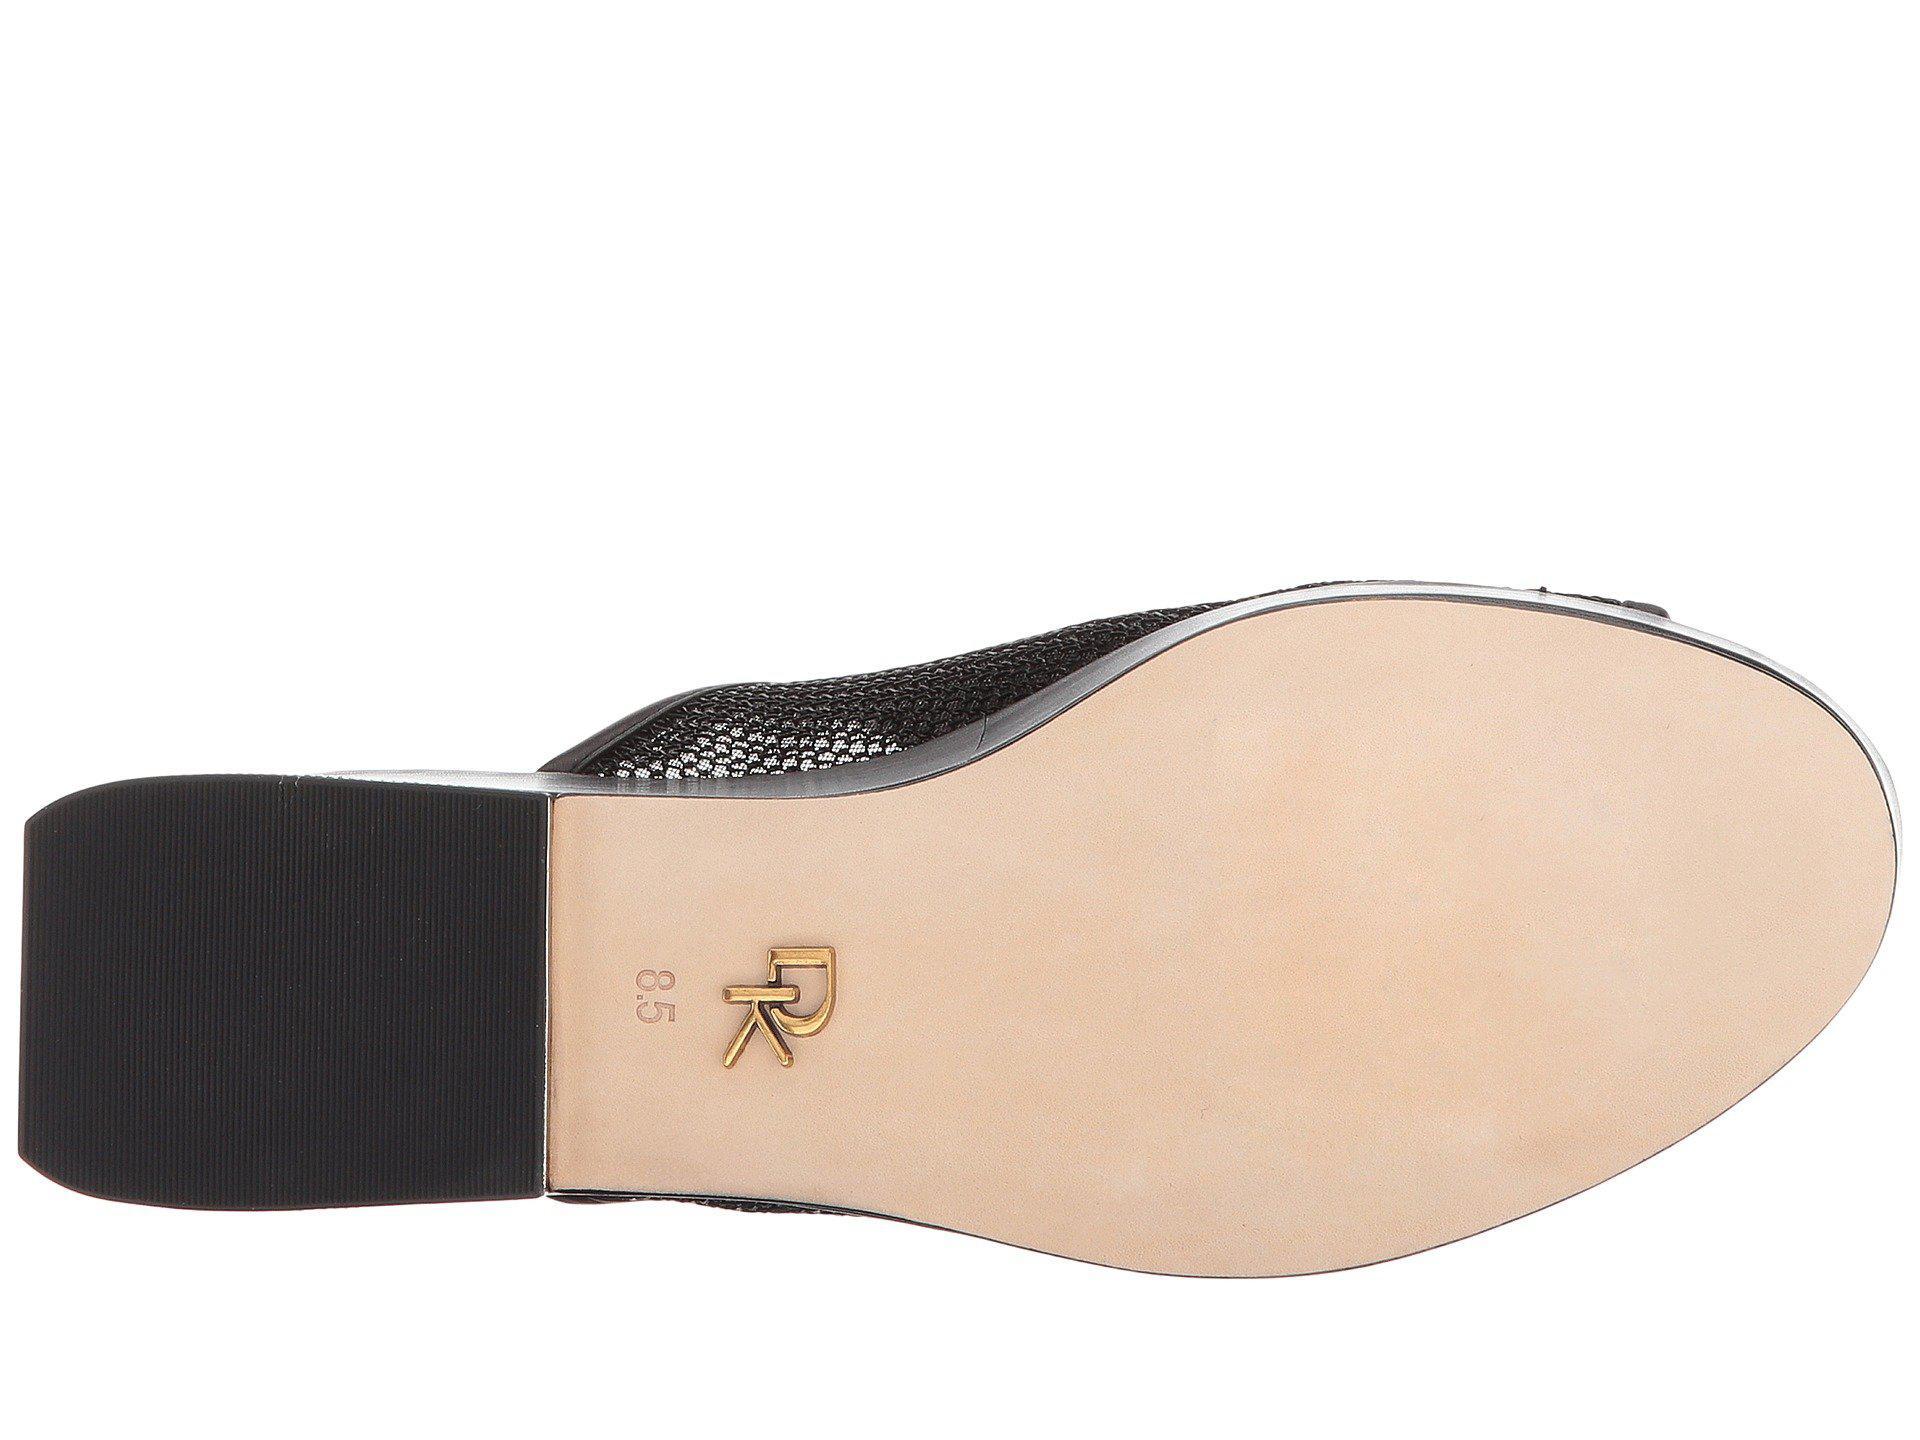 e4df1080c17b Lyst - Donna Karan Sade Sandal in Black